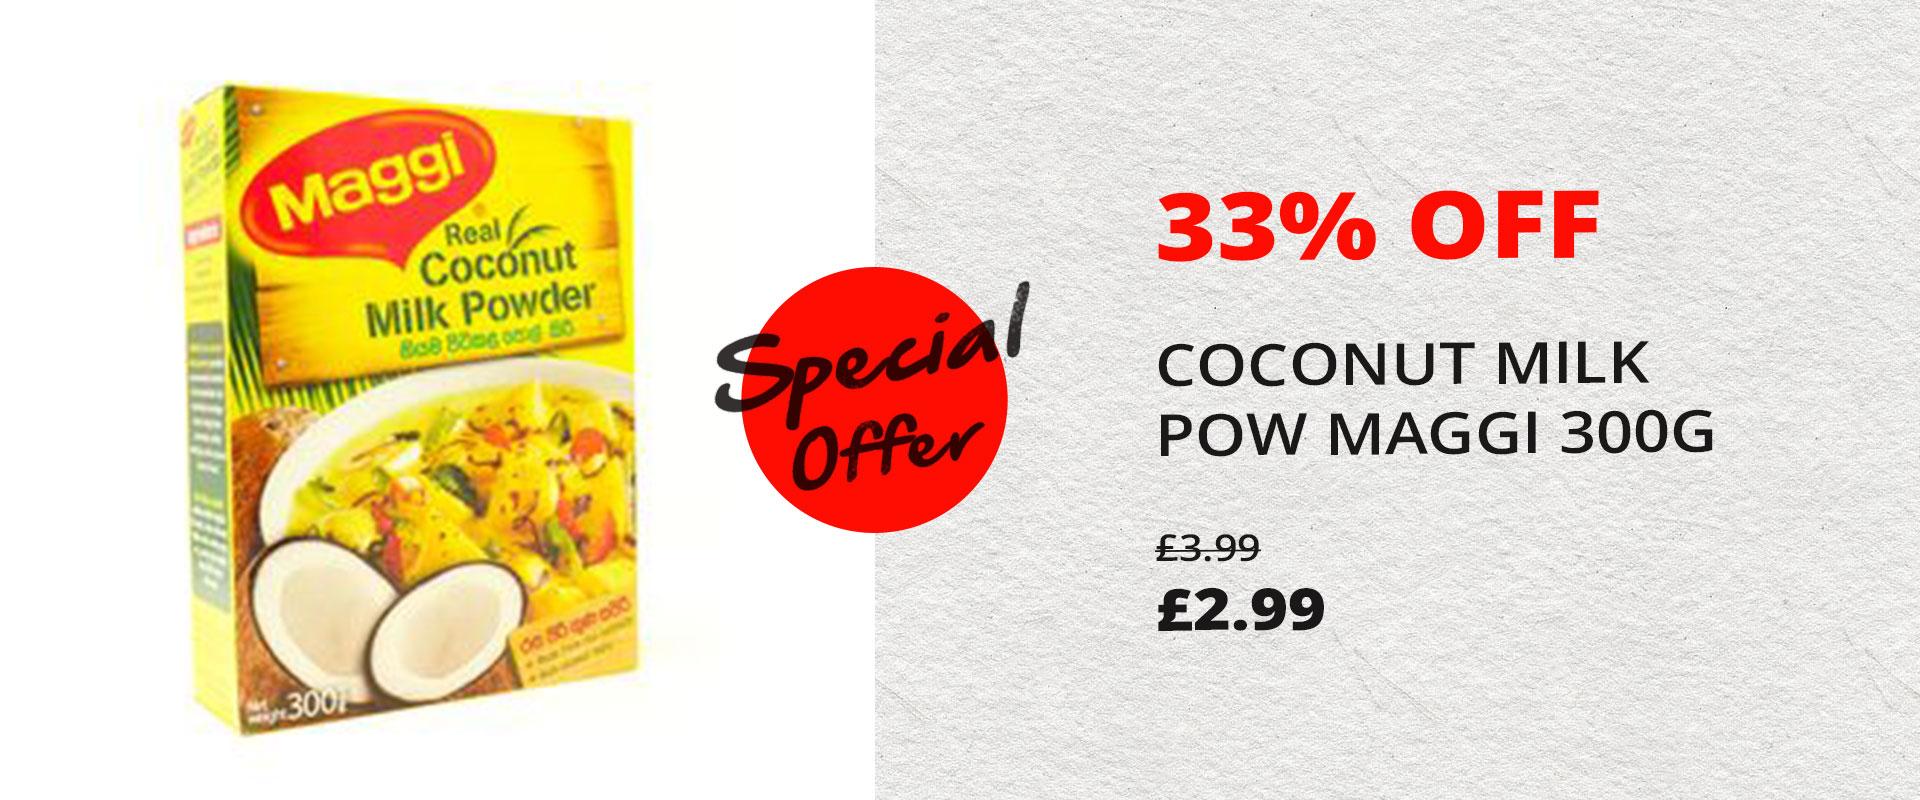 Coconut Milk 33% FF